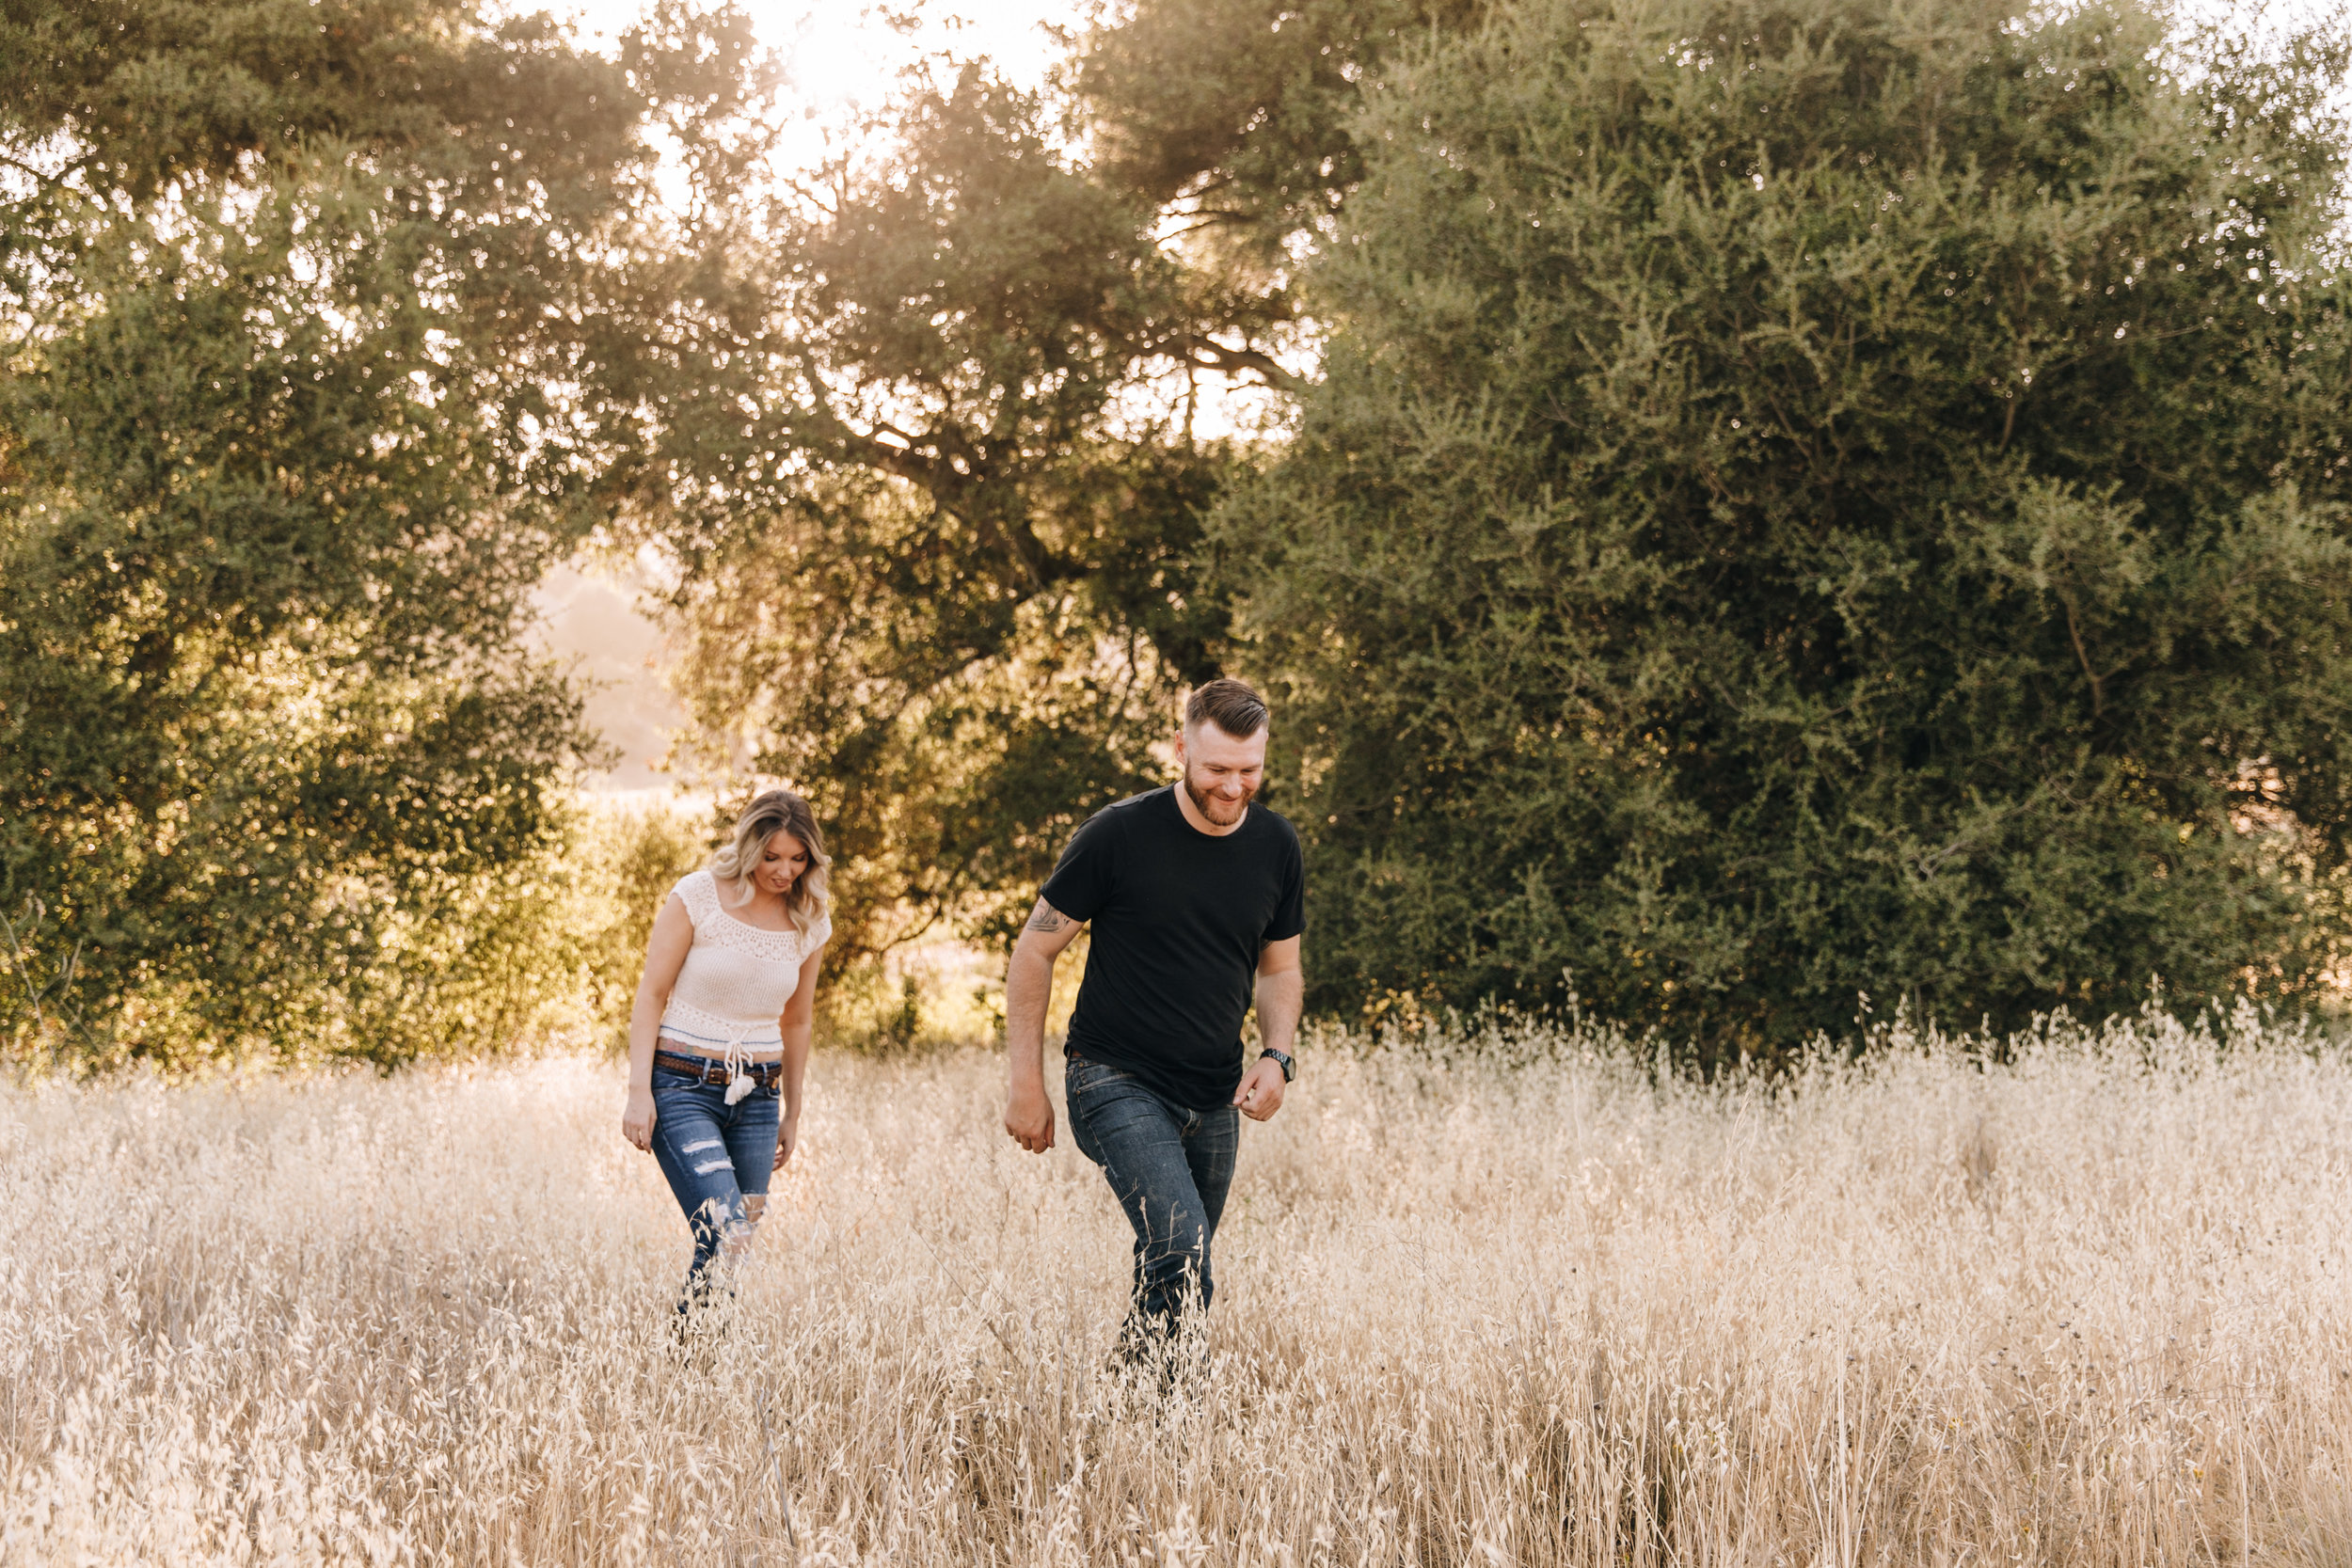 Malibu engagement photographer, SoCal engagement photographer, Southern California engagement photographer, Los Angeles engagement photographer, Malibu Creek State Park engagement shoot, Paradise Cove